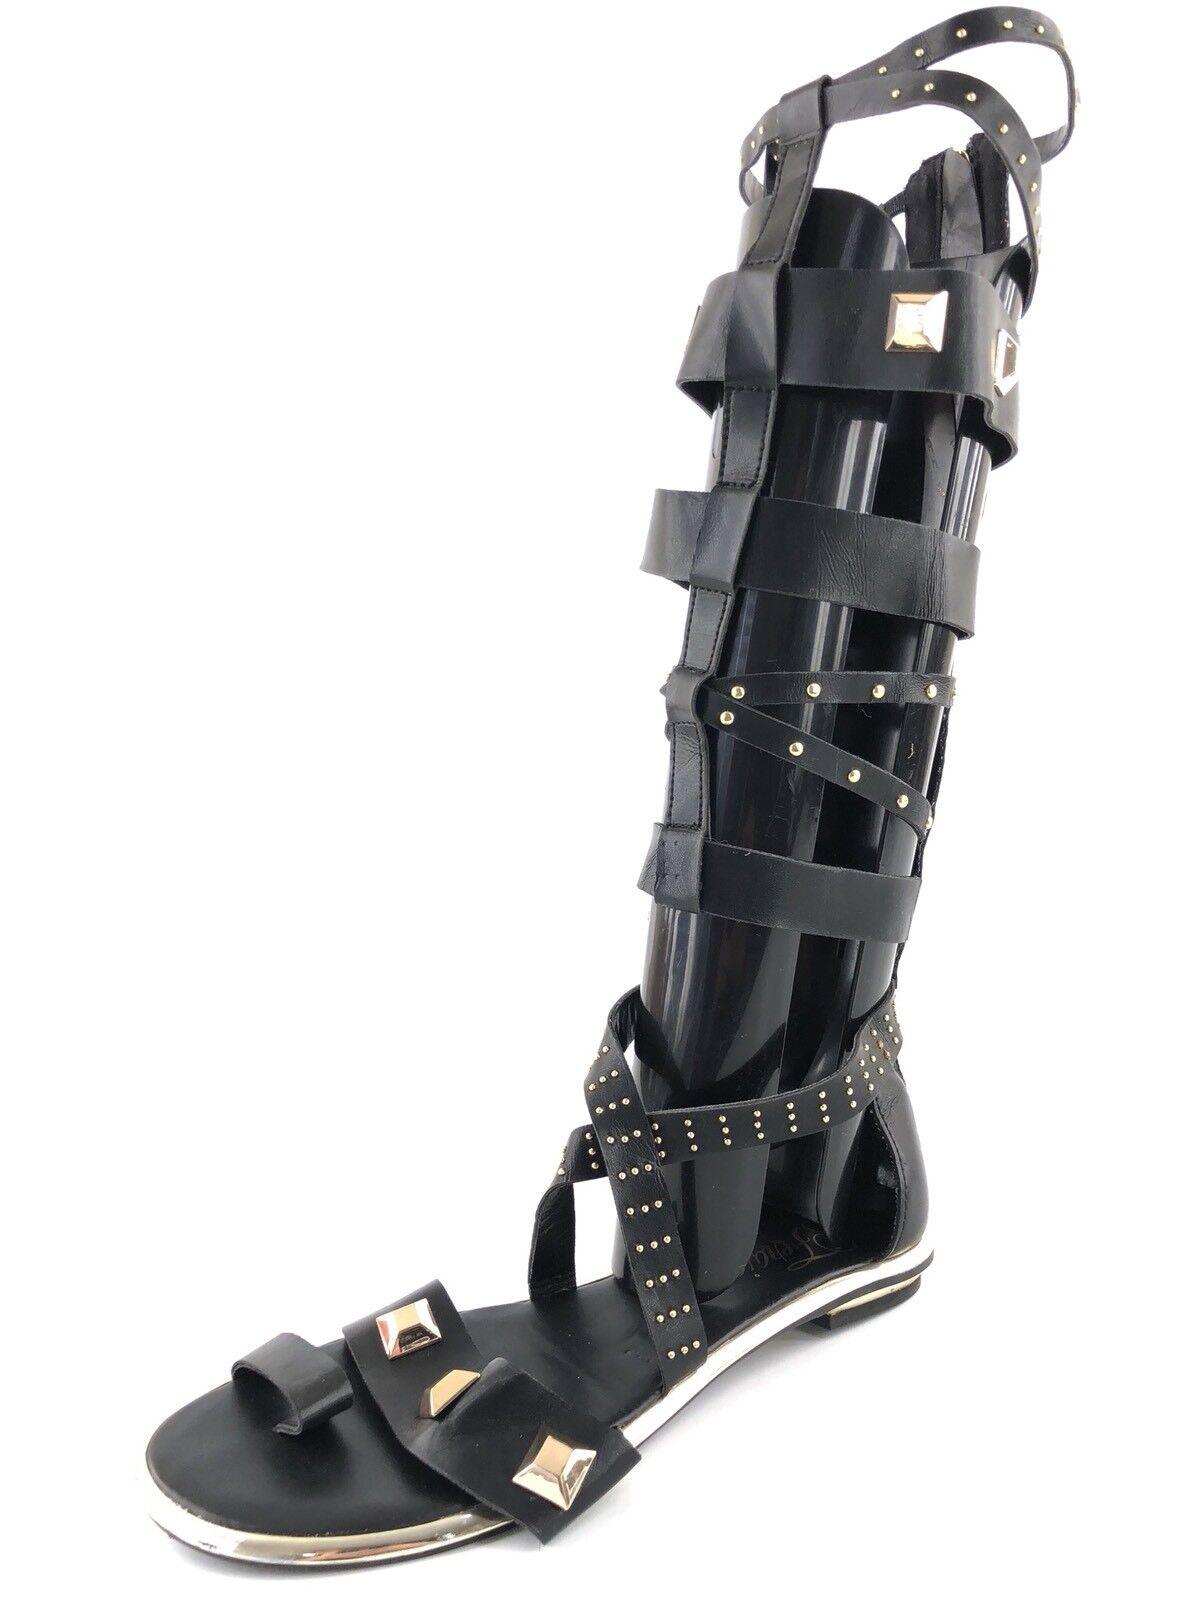 Fergie Savannah Black Zip Up Knee High Gladiator Sandals Womens Size 7 M